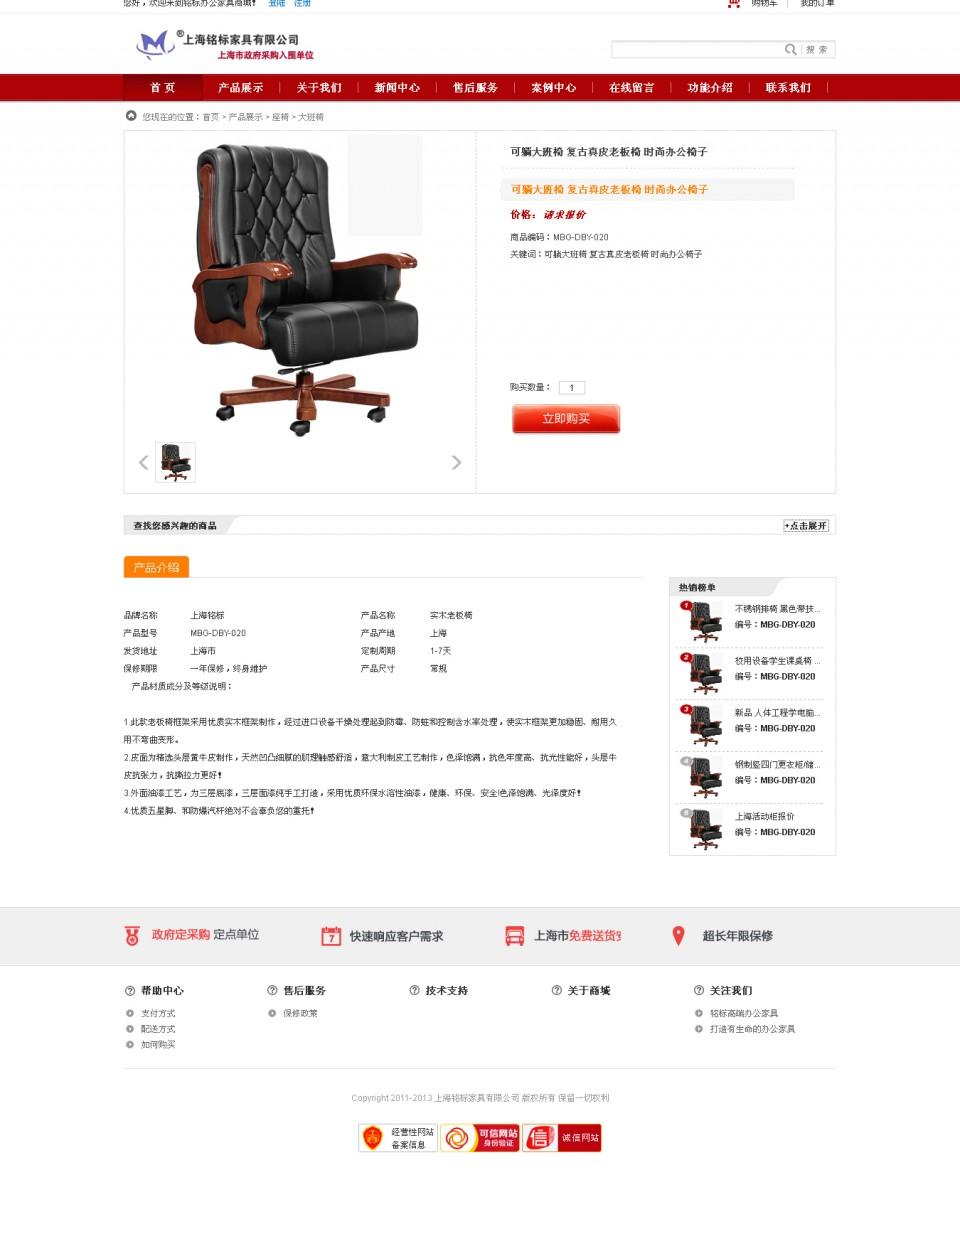 产品显示页